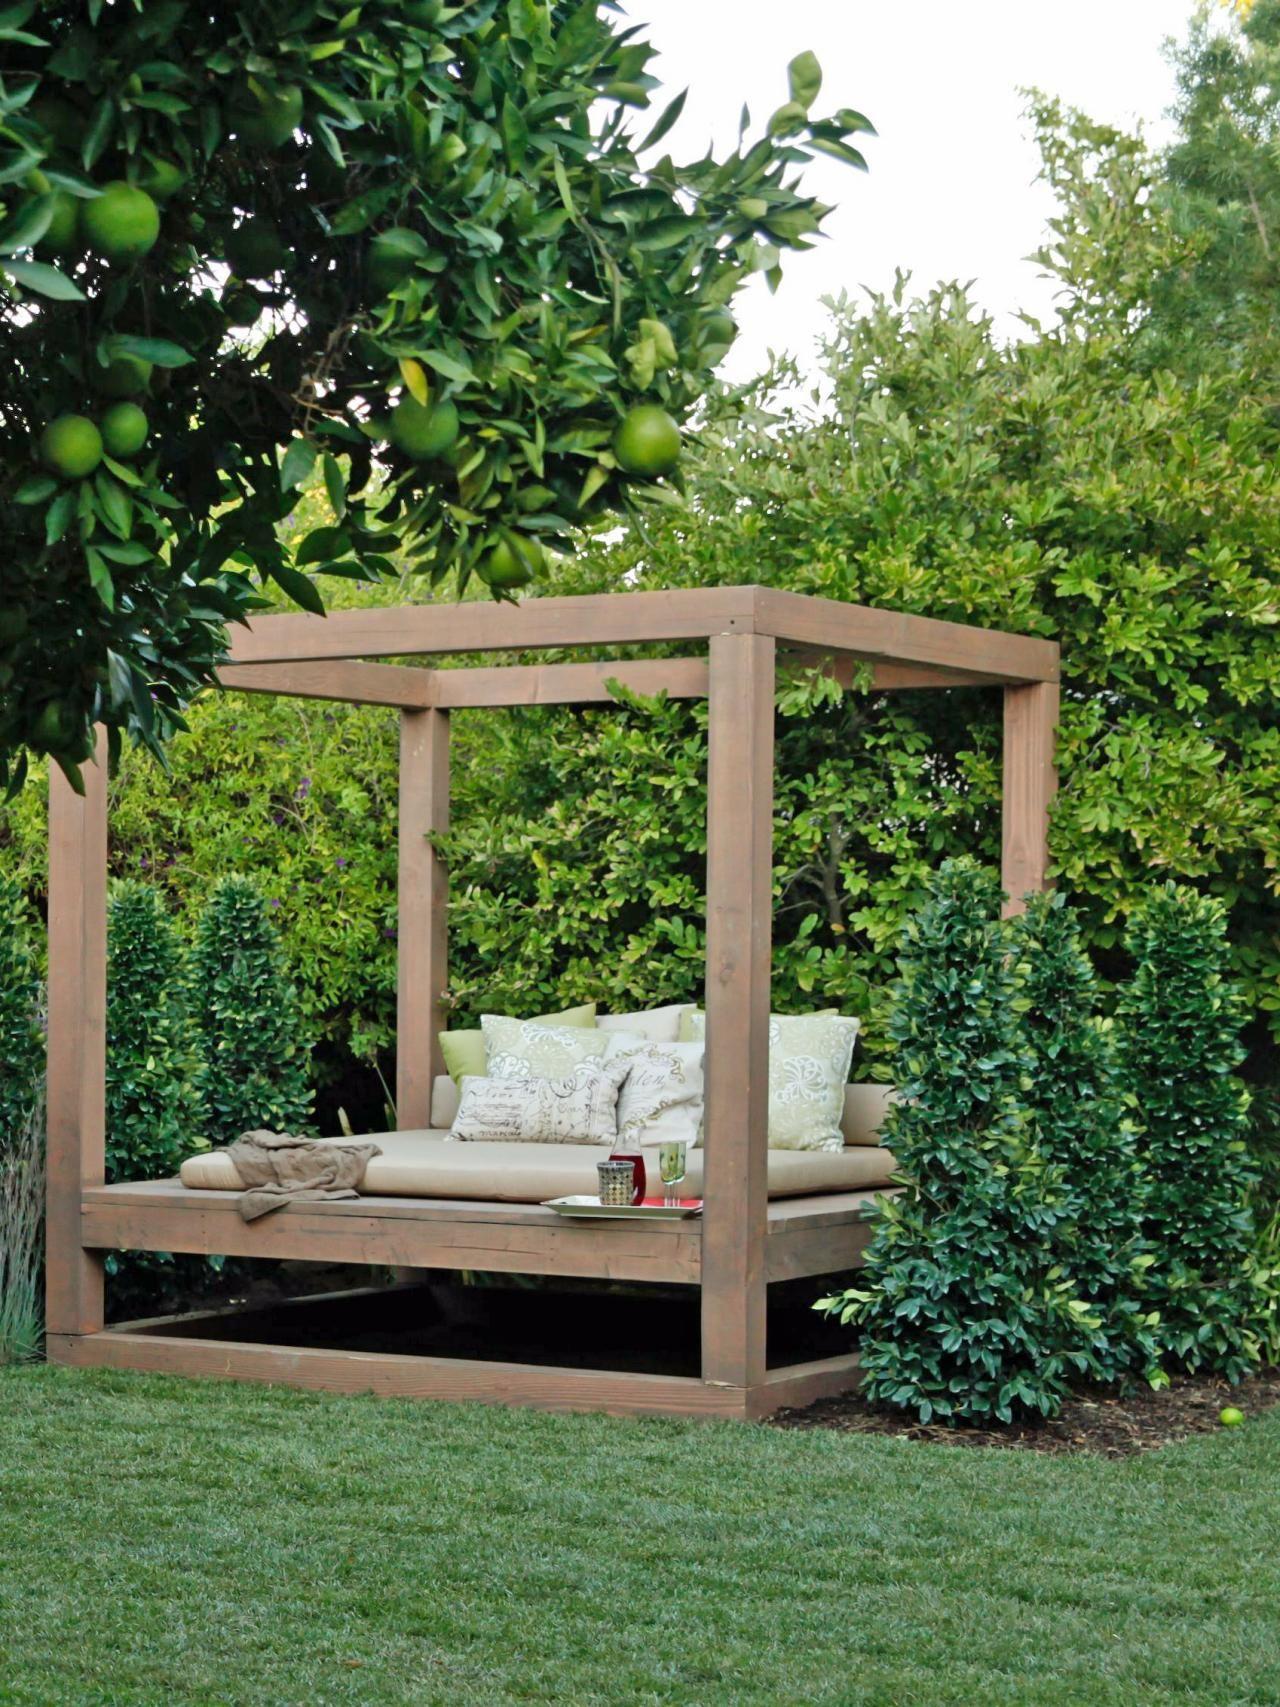 cheap trees garden camping eno hammocksneedtrees that top hammocks buy azul outdoor plant products companies best madera the hammock